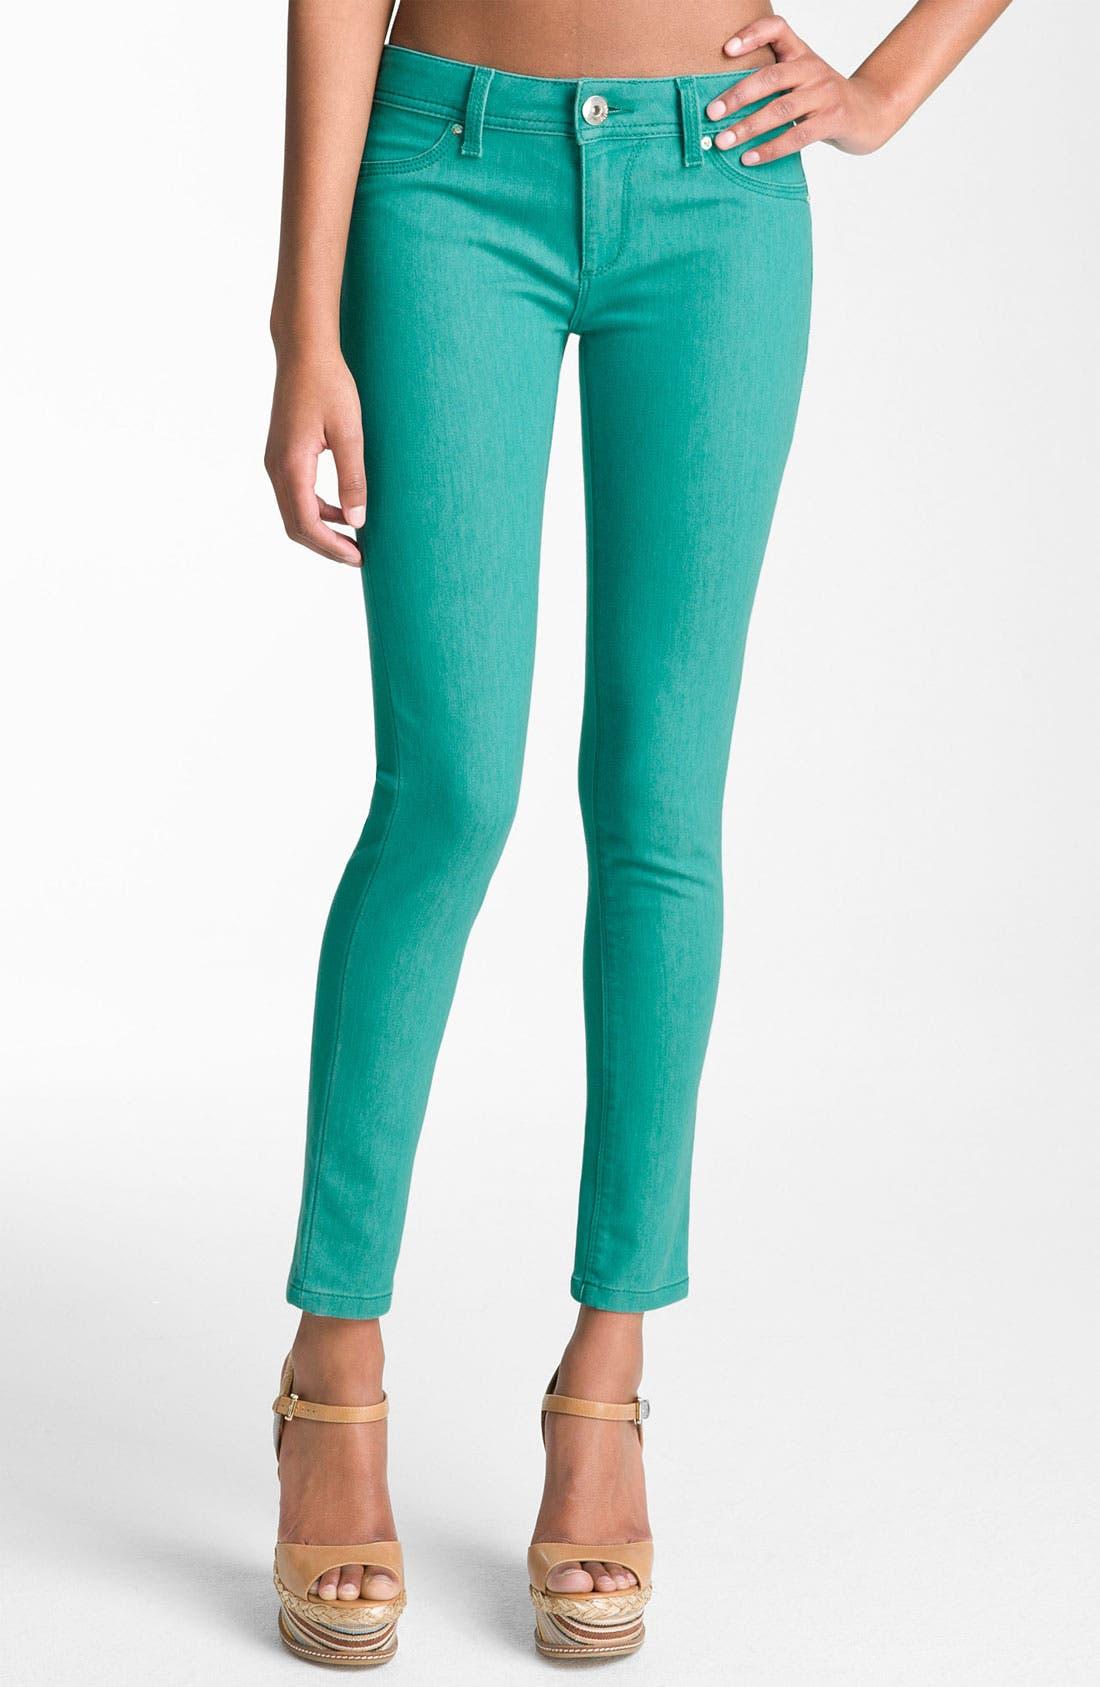 Main Image - DL1961 'Emma' Skinny Jeans (Seaglass)